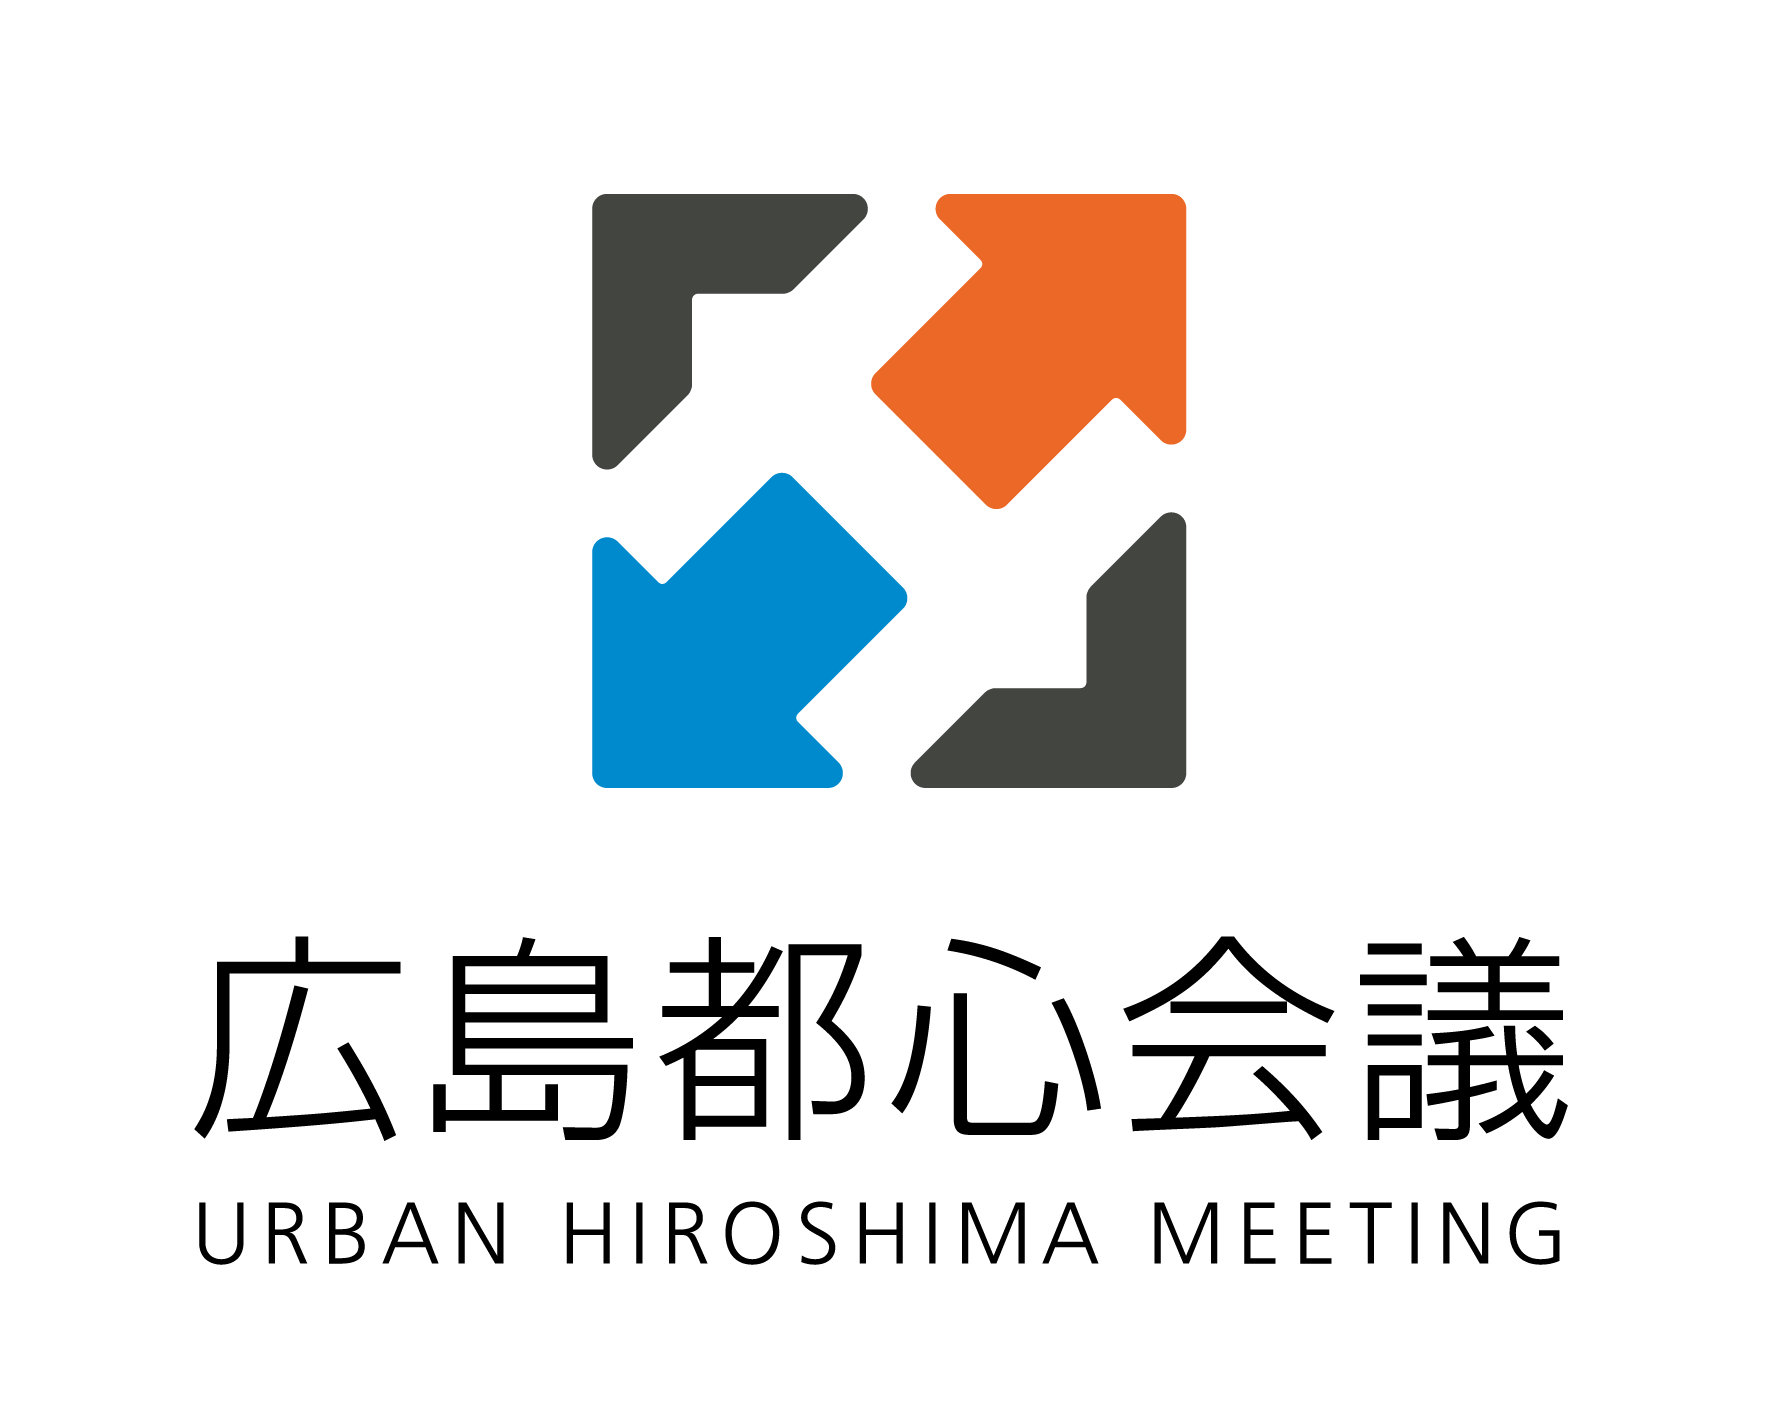 UHM logo color tate